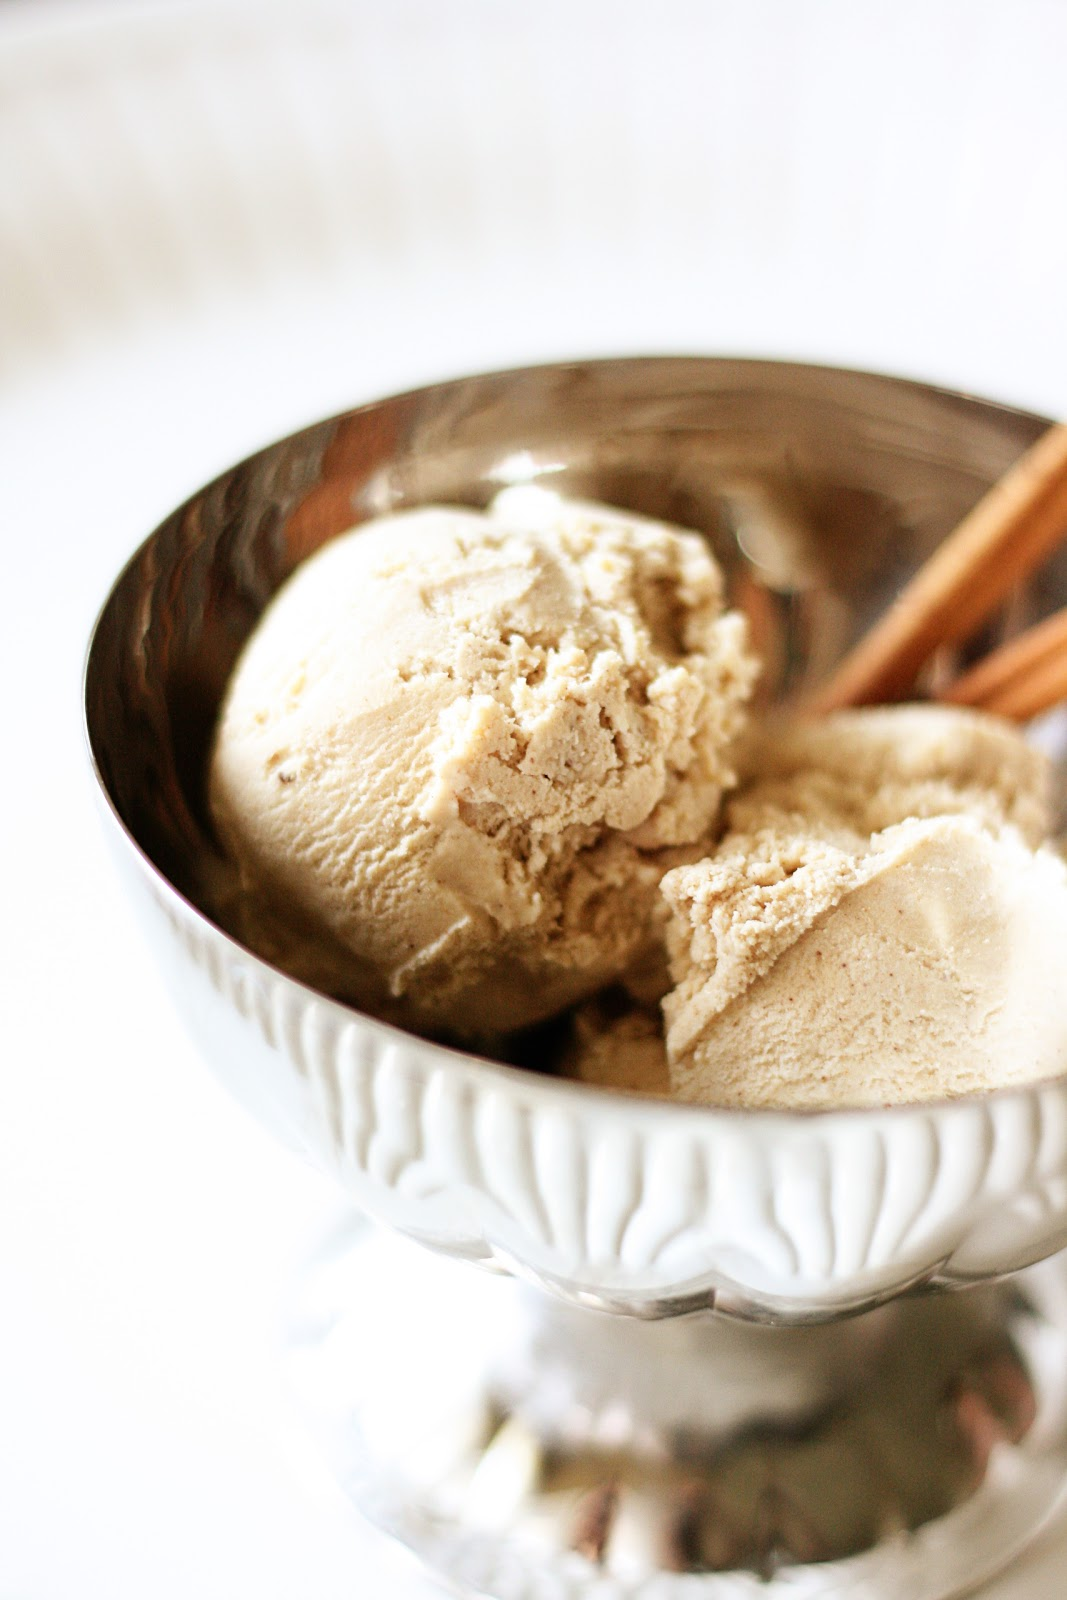 Naughty Carbs: Cinnamon Ice Cream (Low Carb)